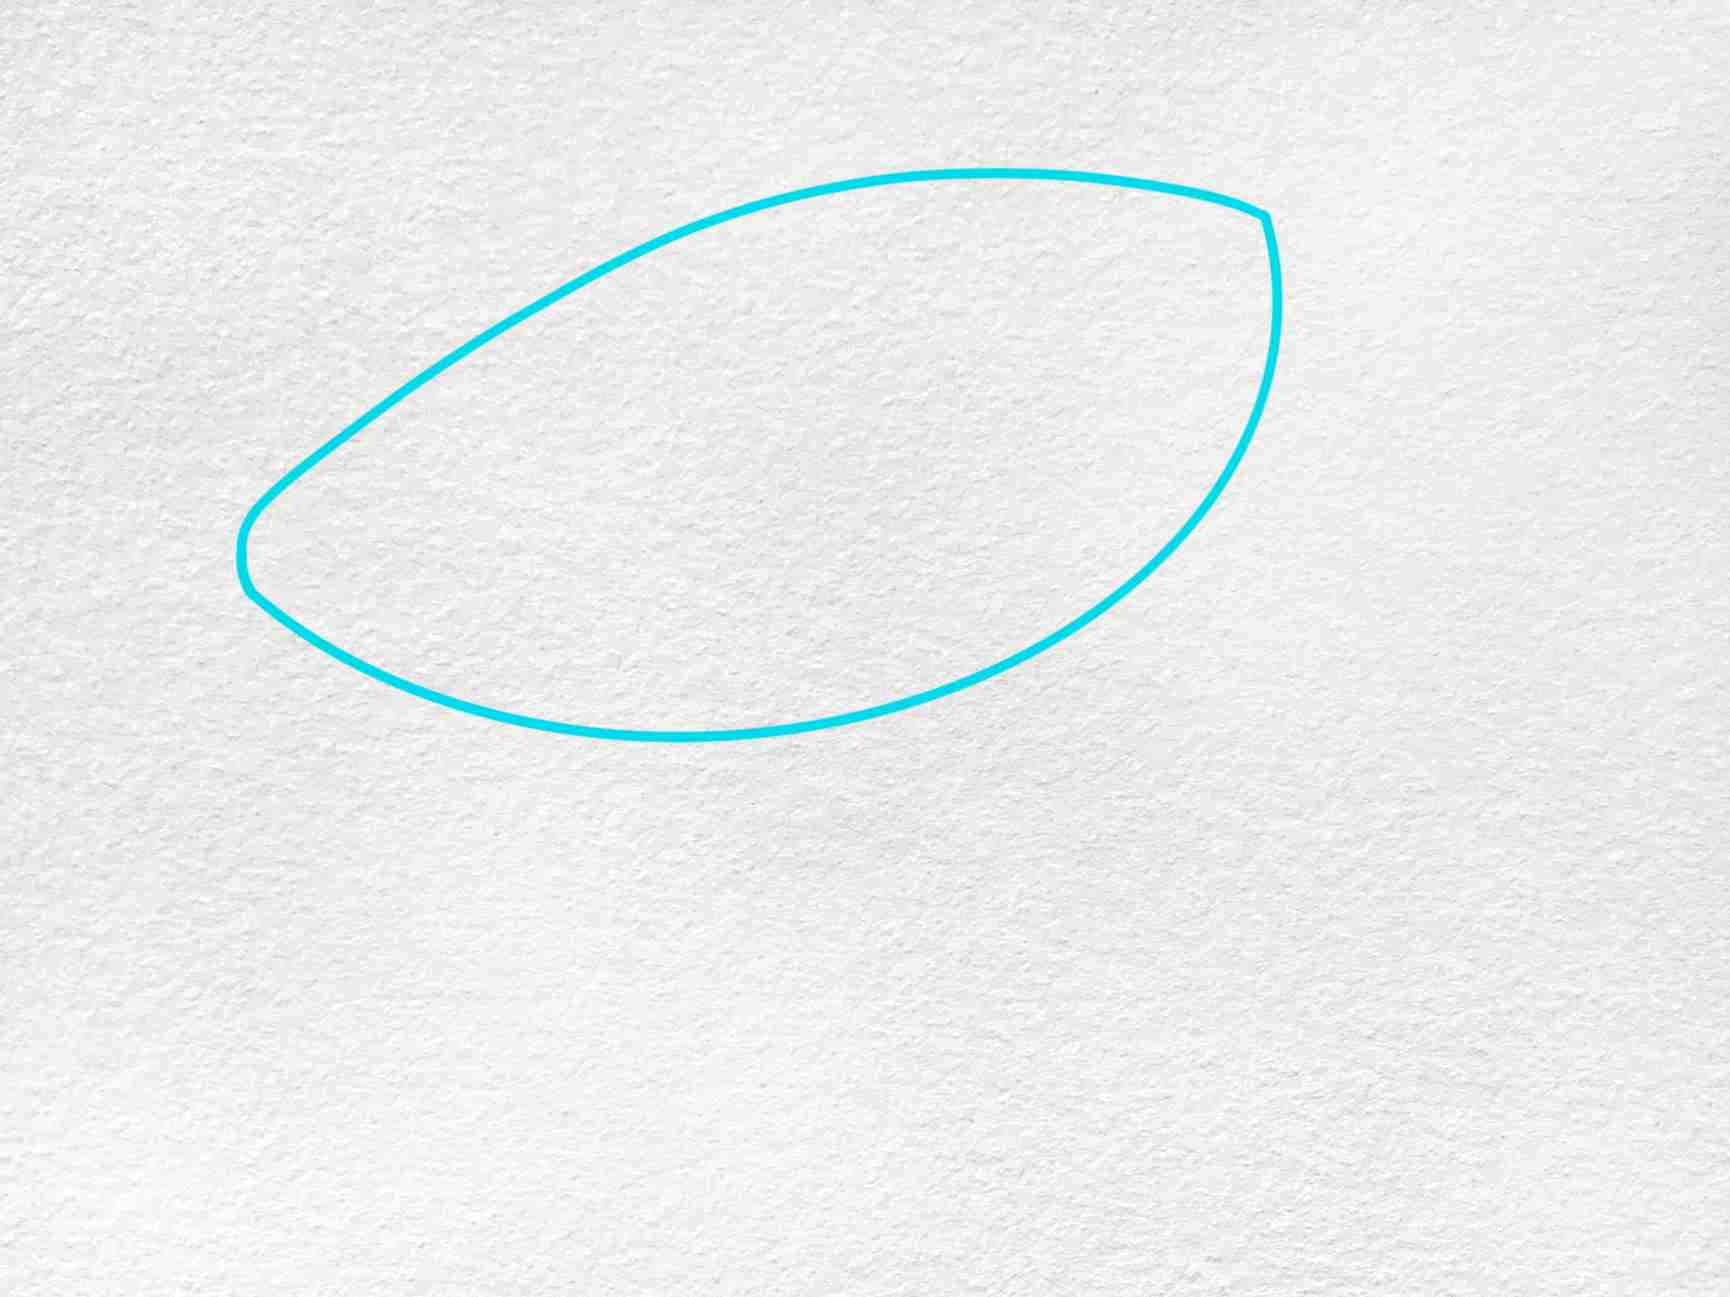 Sea Turtle Drawing Easy: Step 1